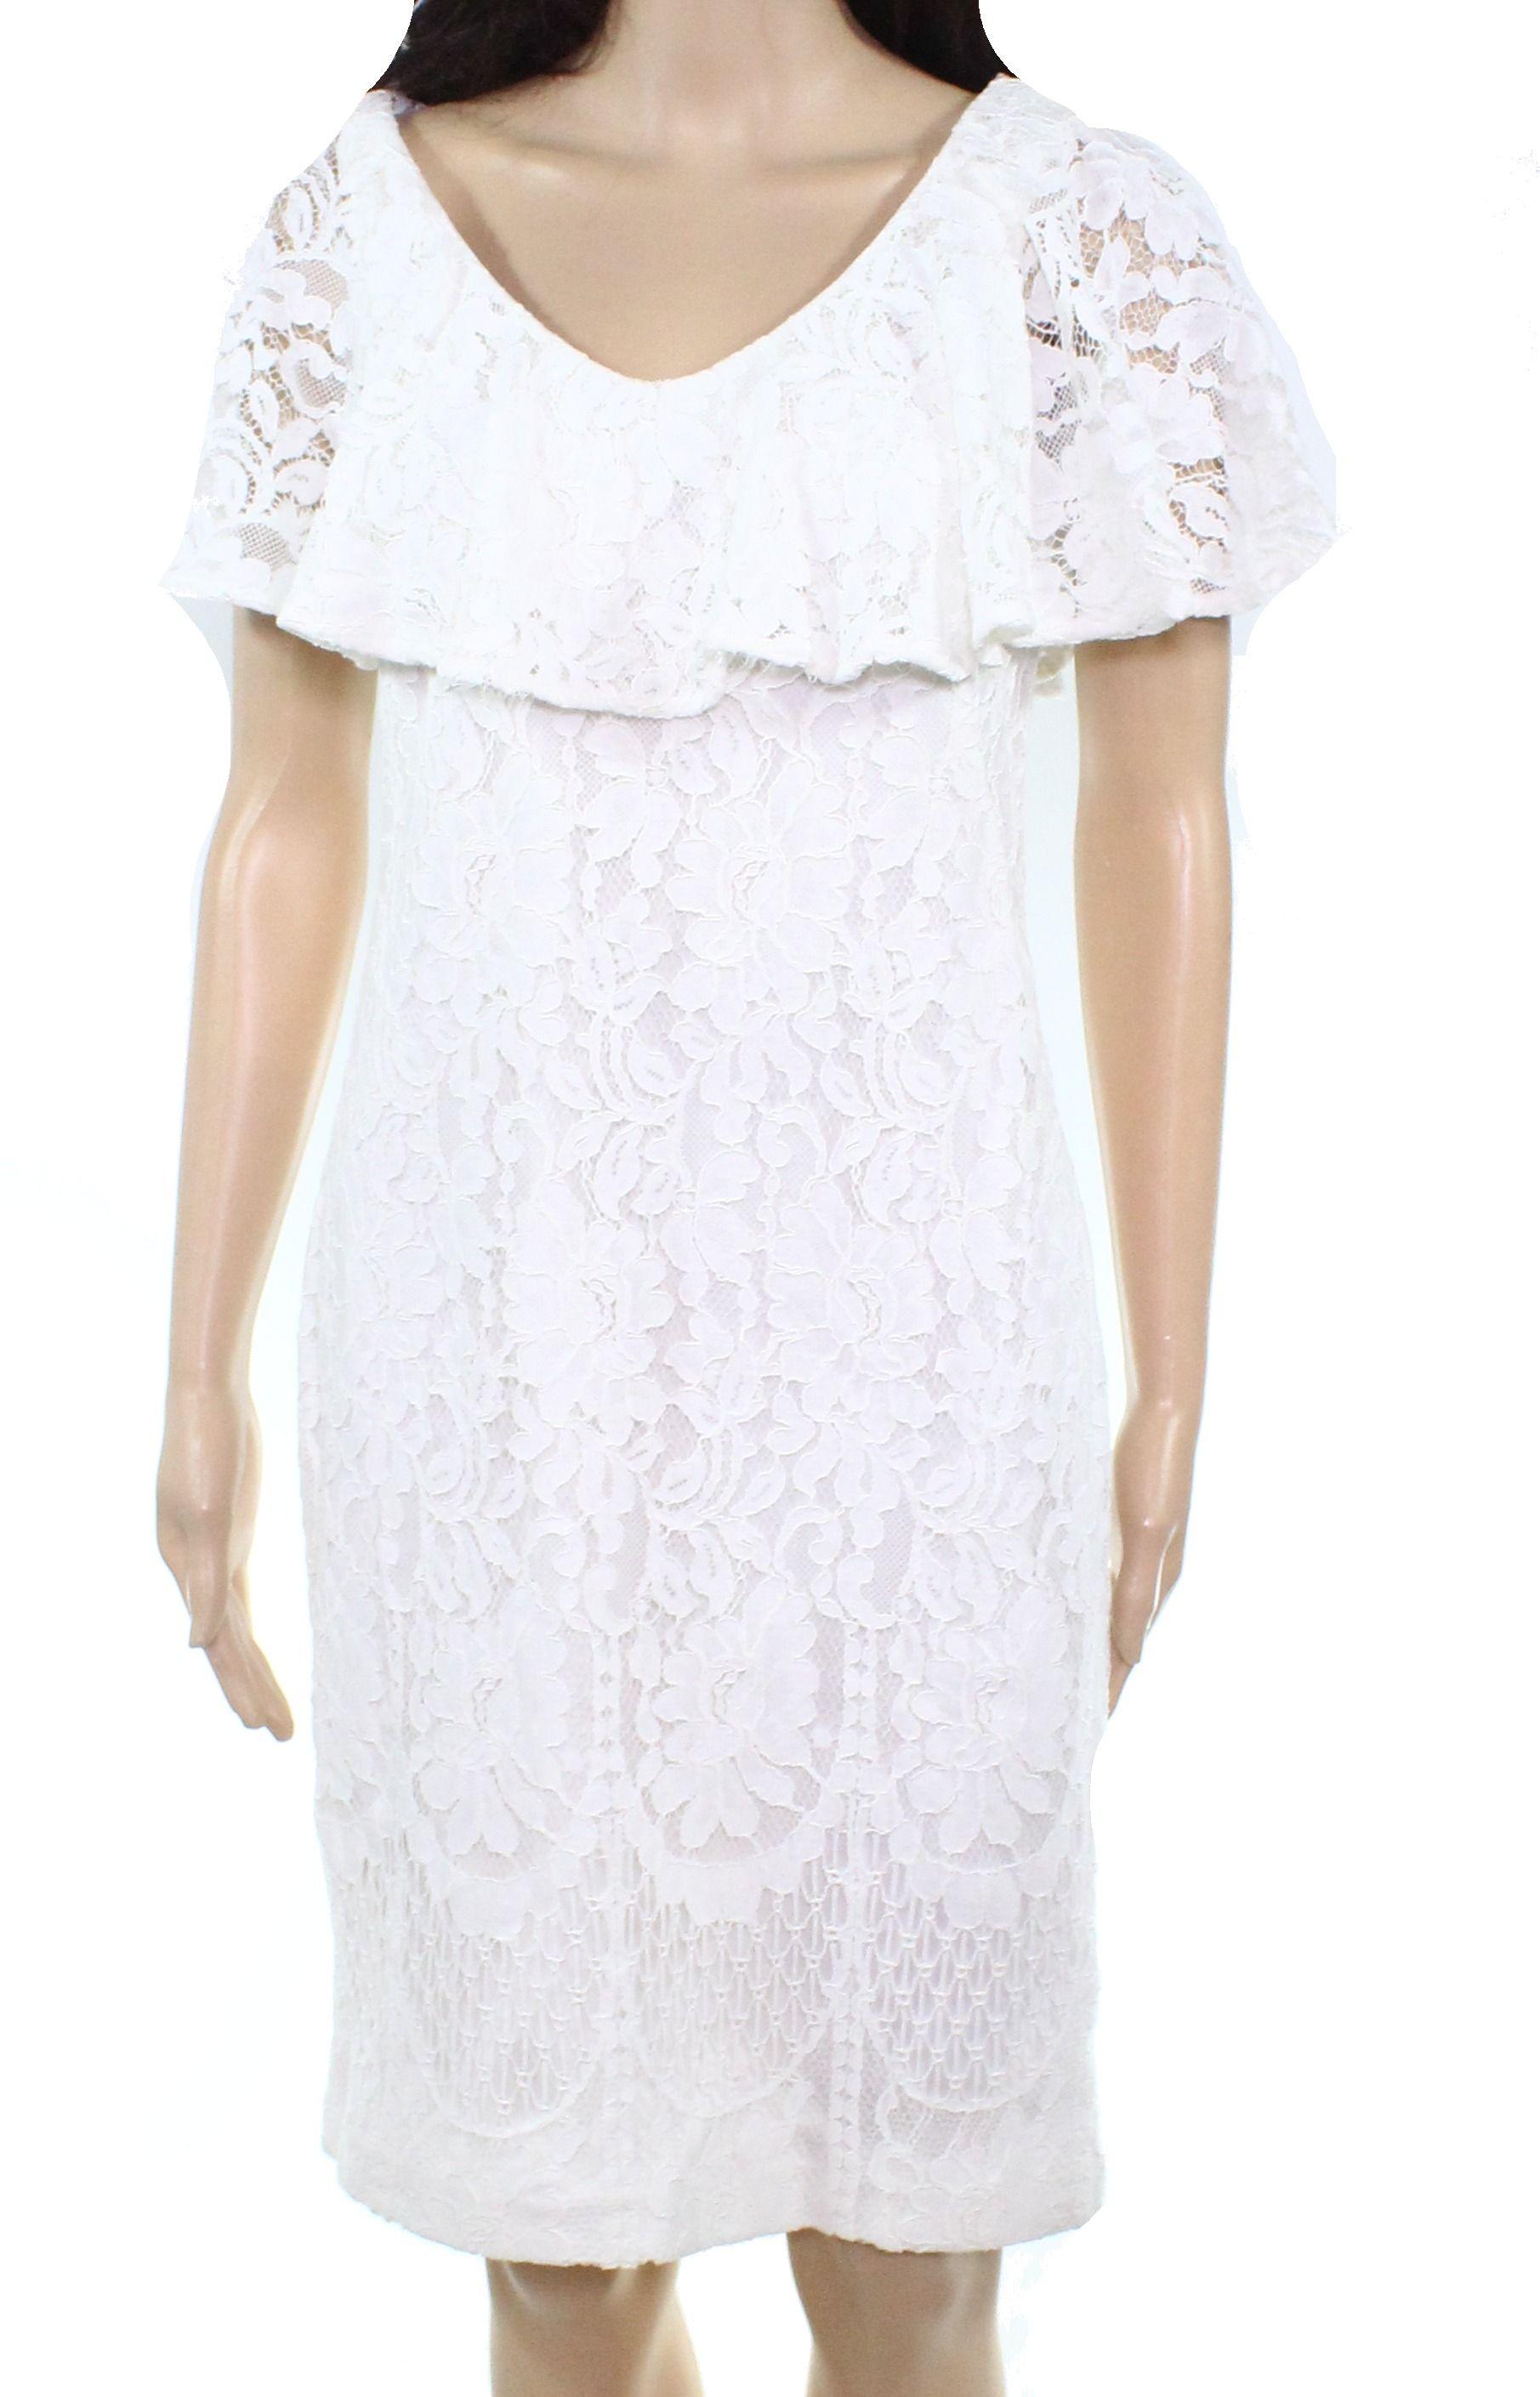 Lauren By Ralph Lauren Women's Dress White Size 4 Sheath Lace V Neck